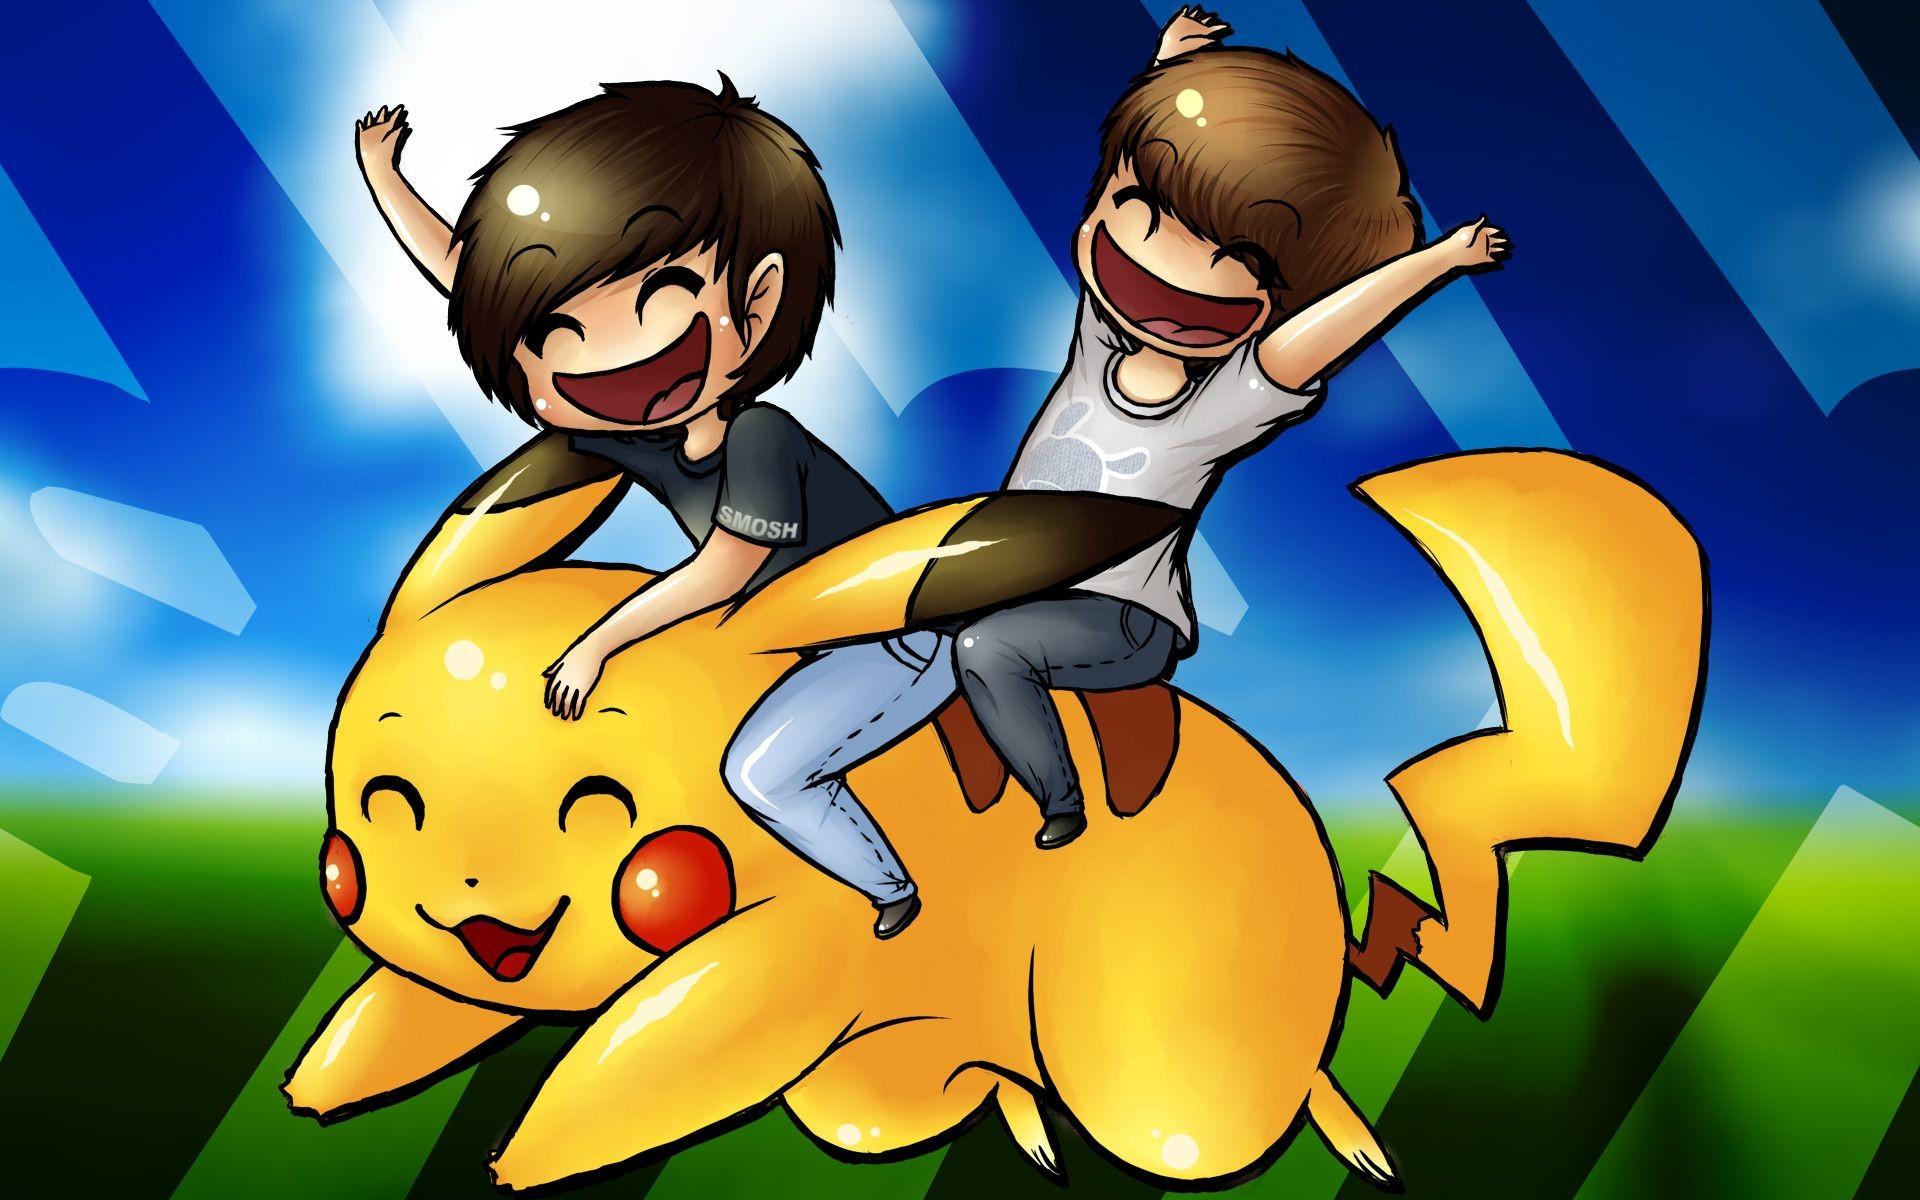 Free download pikachu backgrounds wallpaper HD.